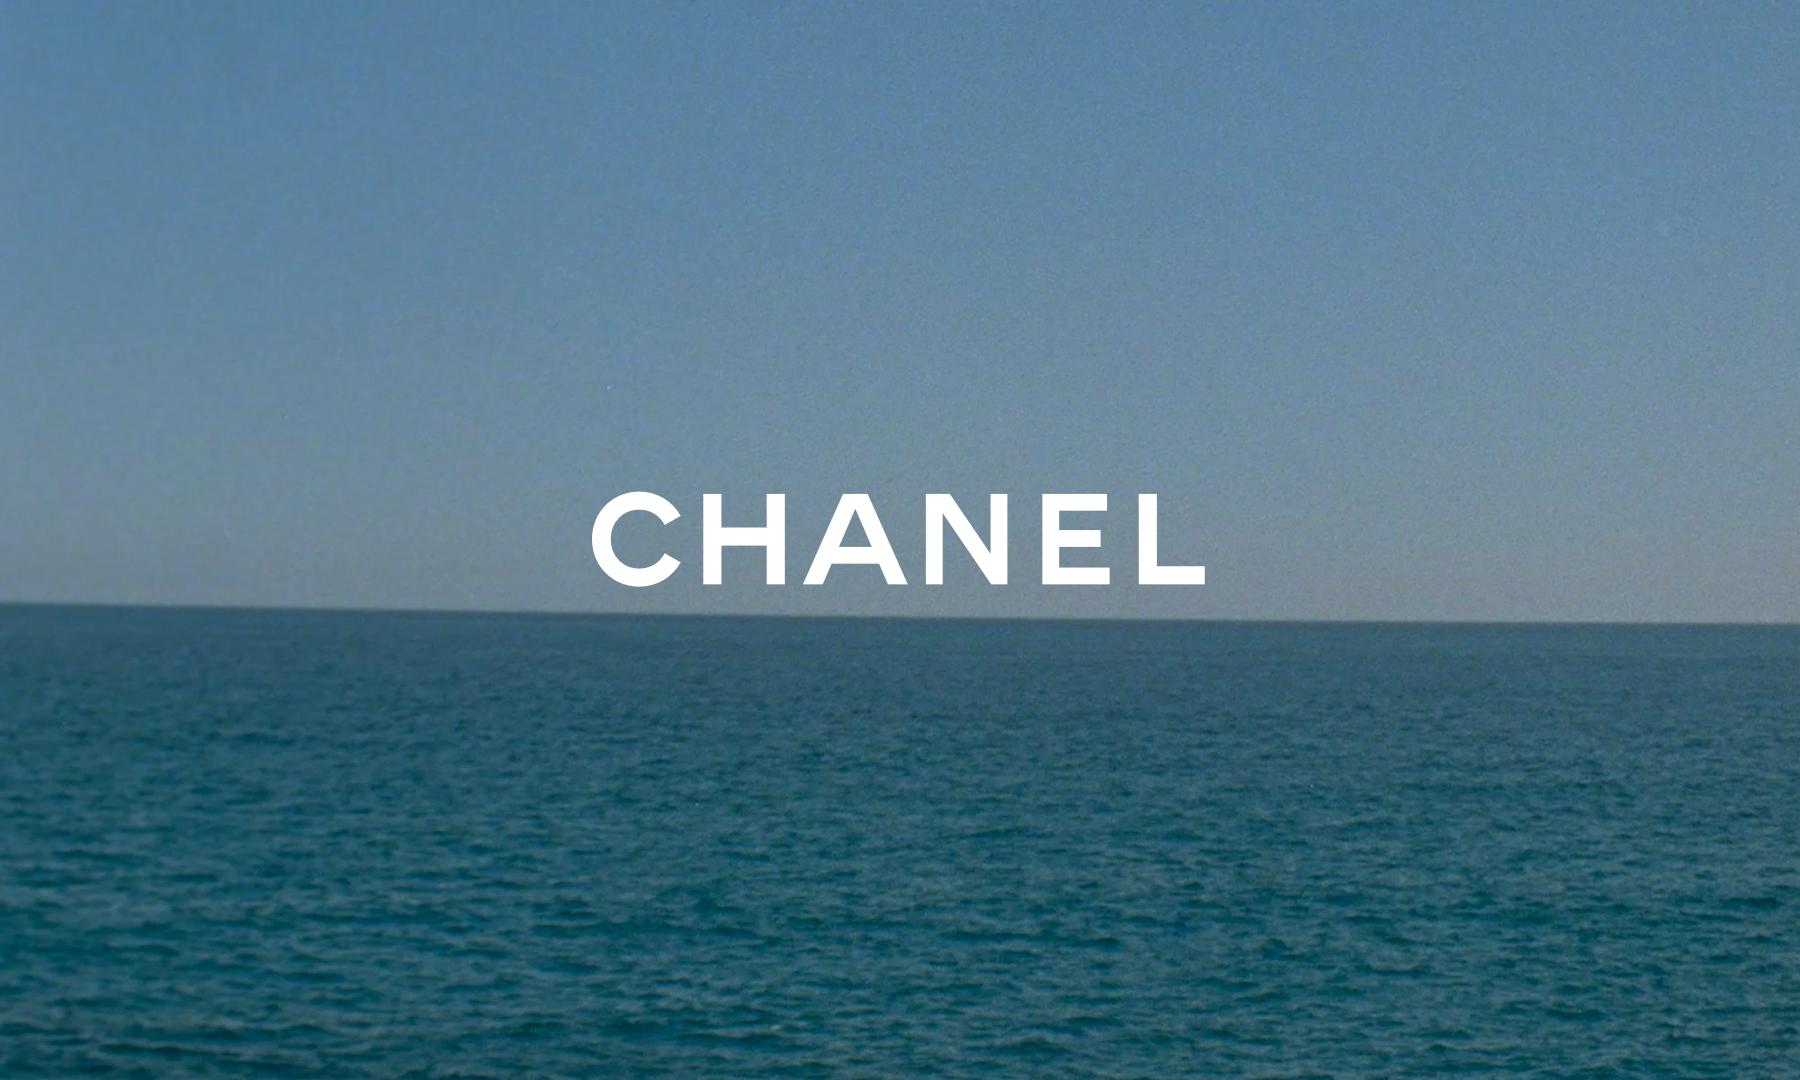 CHANEL 2021 早春度假系列将于今日线上发布